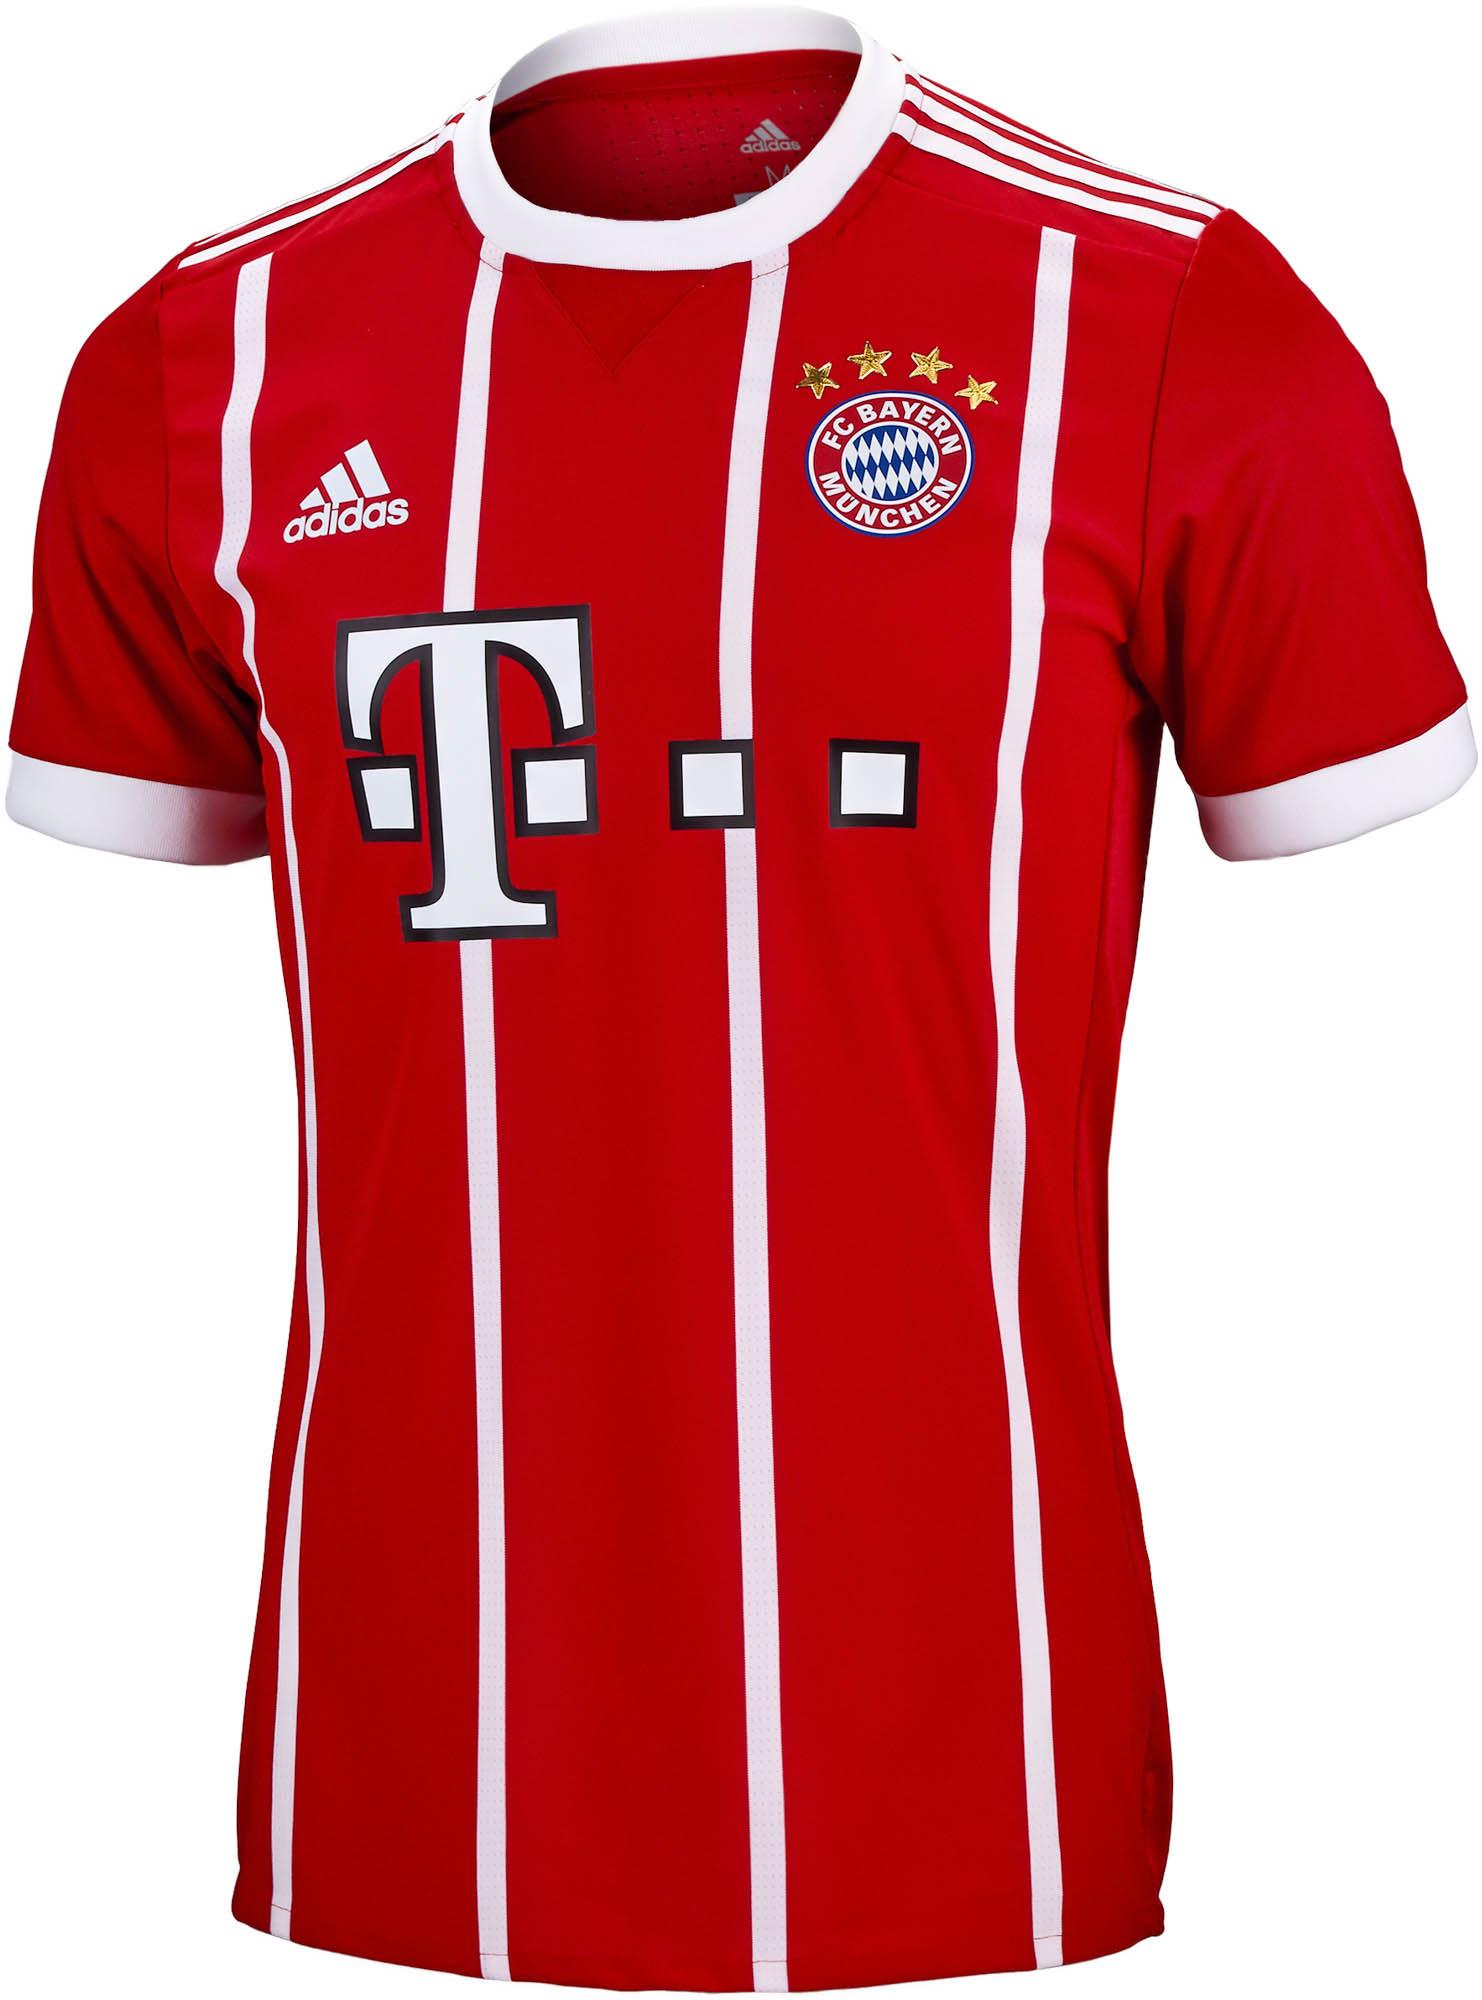 058f4d76b 2017/18 adidas Bayern Munich Authentic Home Jersey - SoccerPro.com